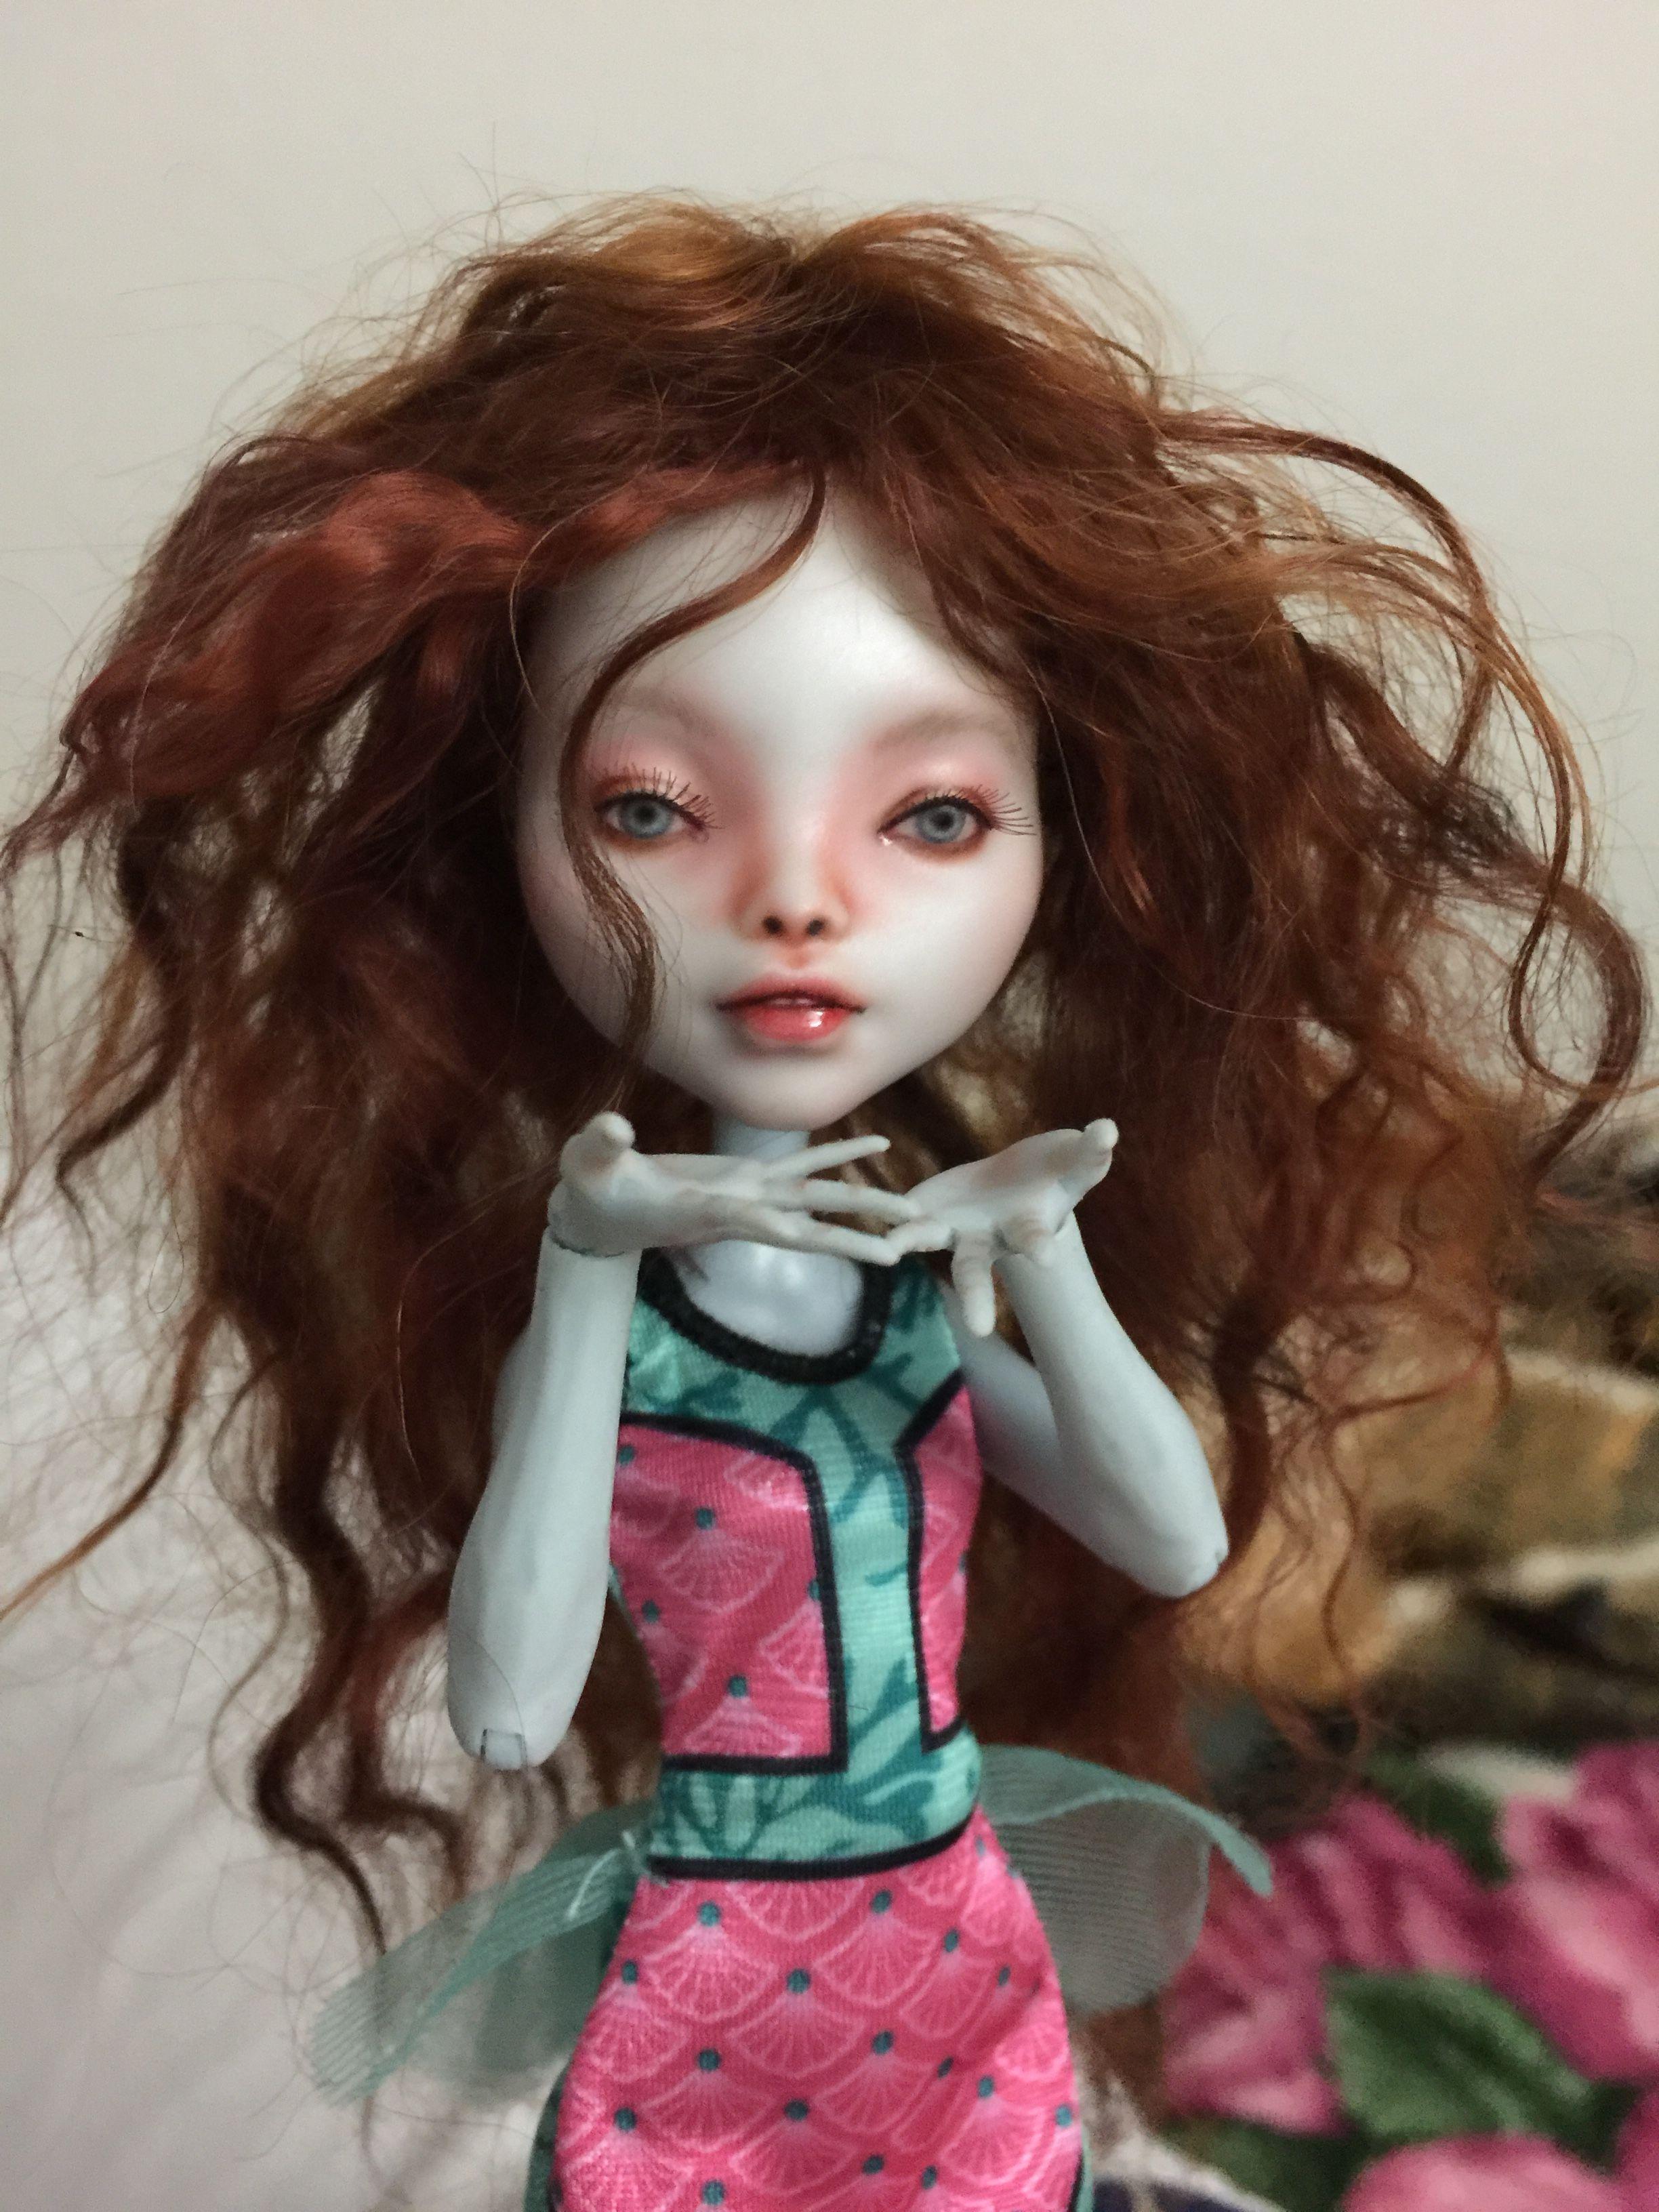 One of the three dolls I repainted last summer 2016. Bek R.